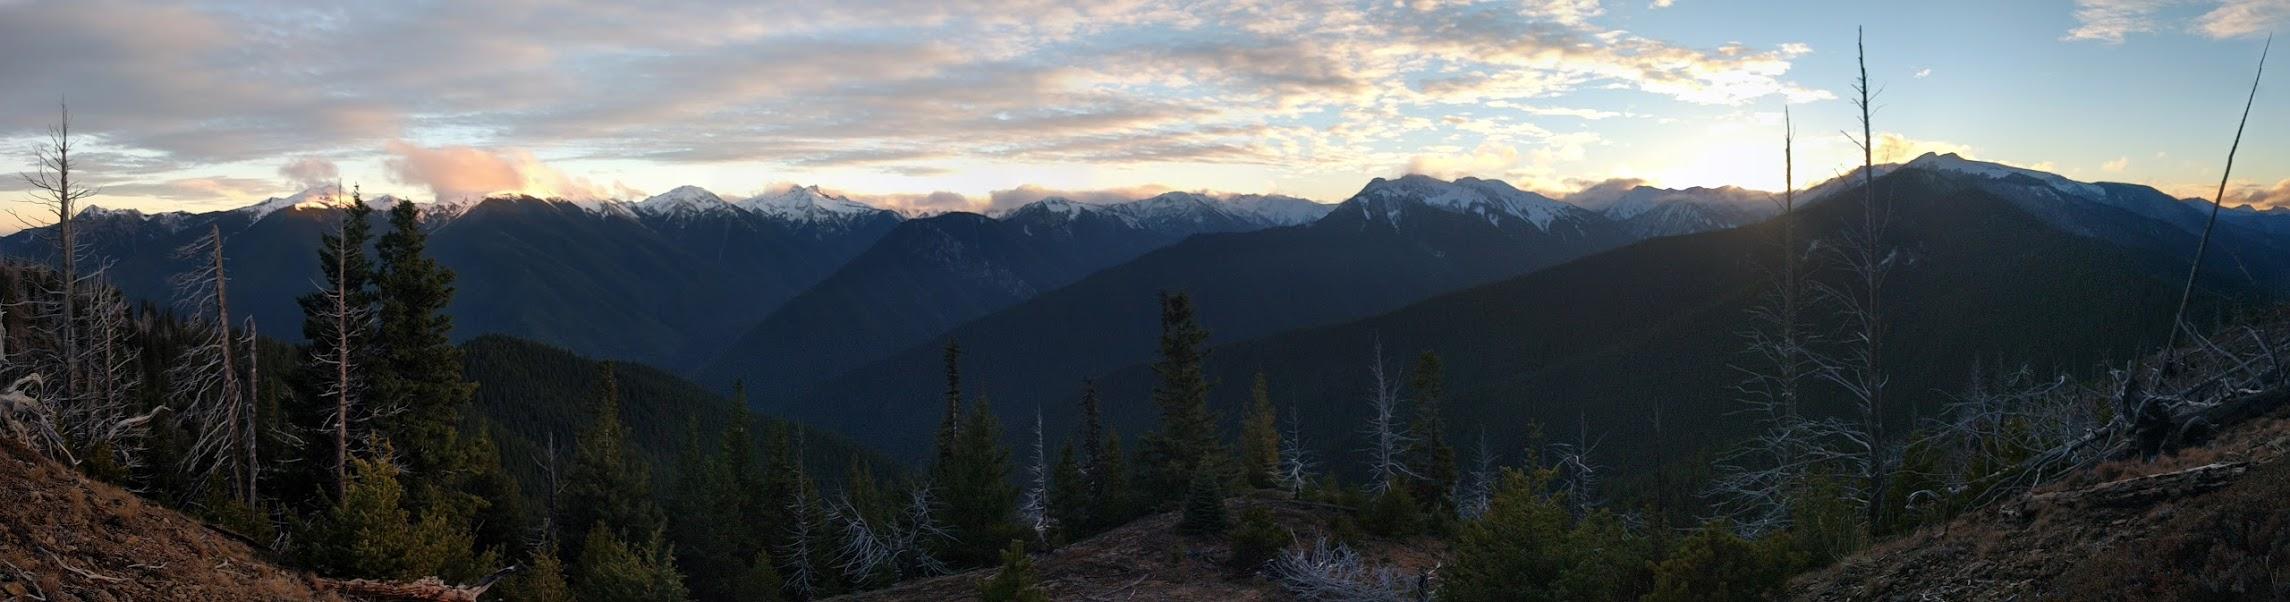 Sunset from camp. Photo courtesy of Jordan Long